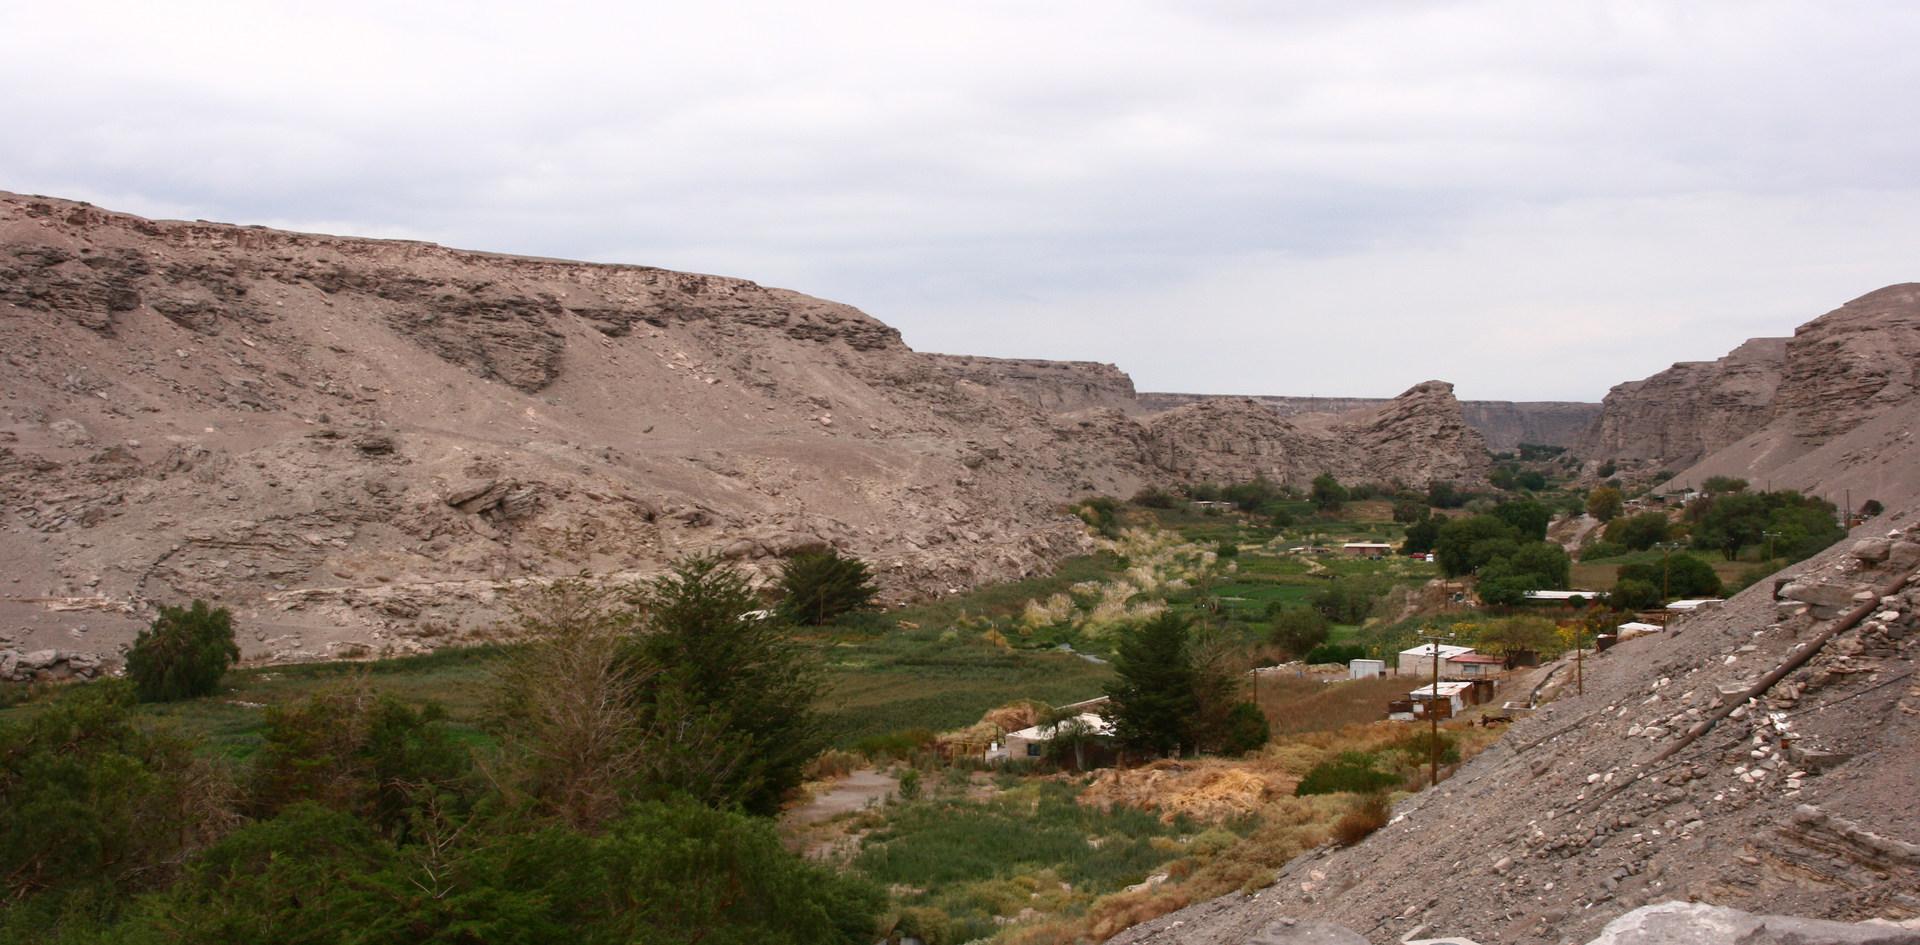 Loa River valley